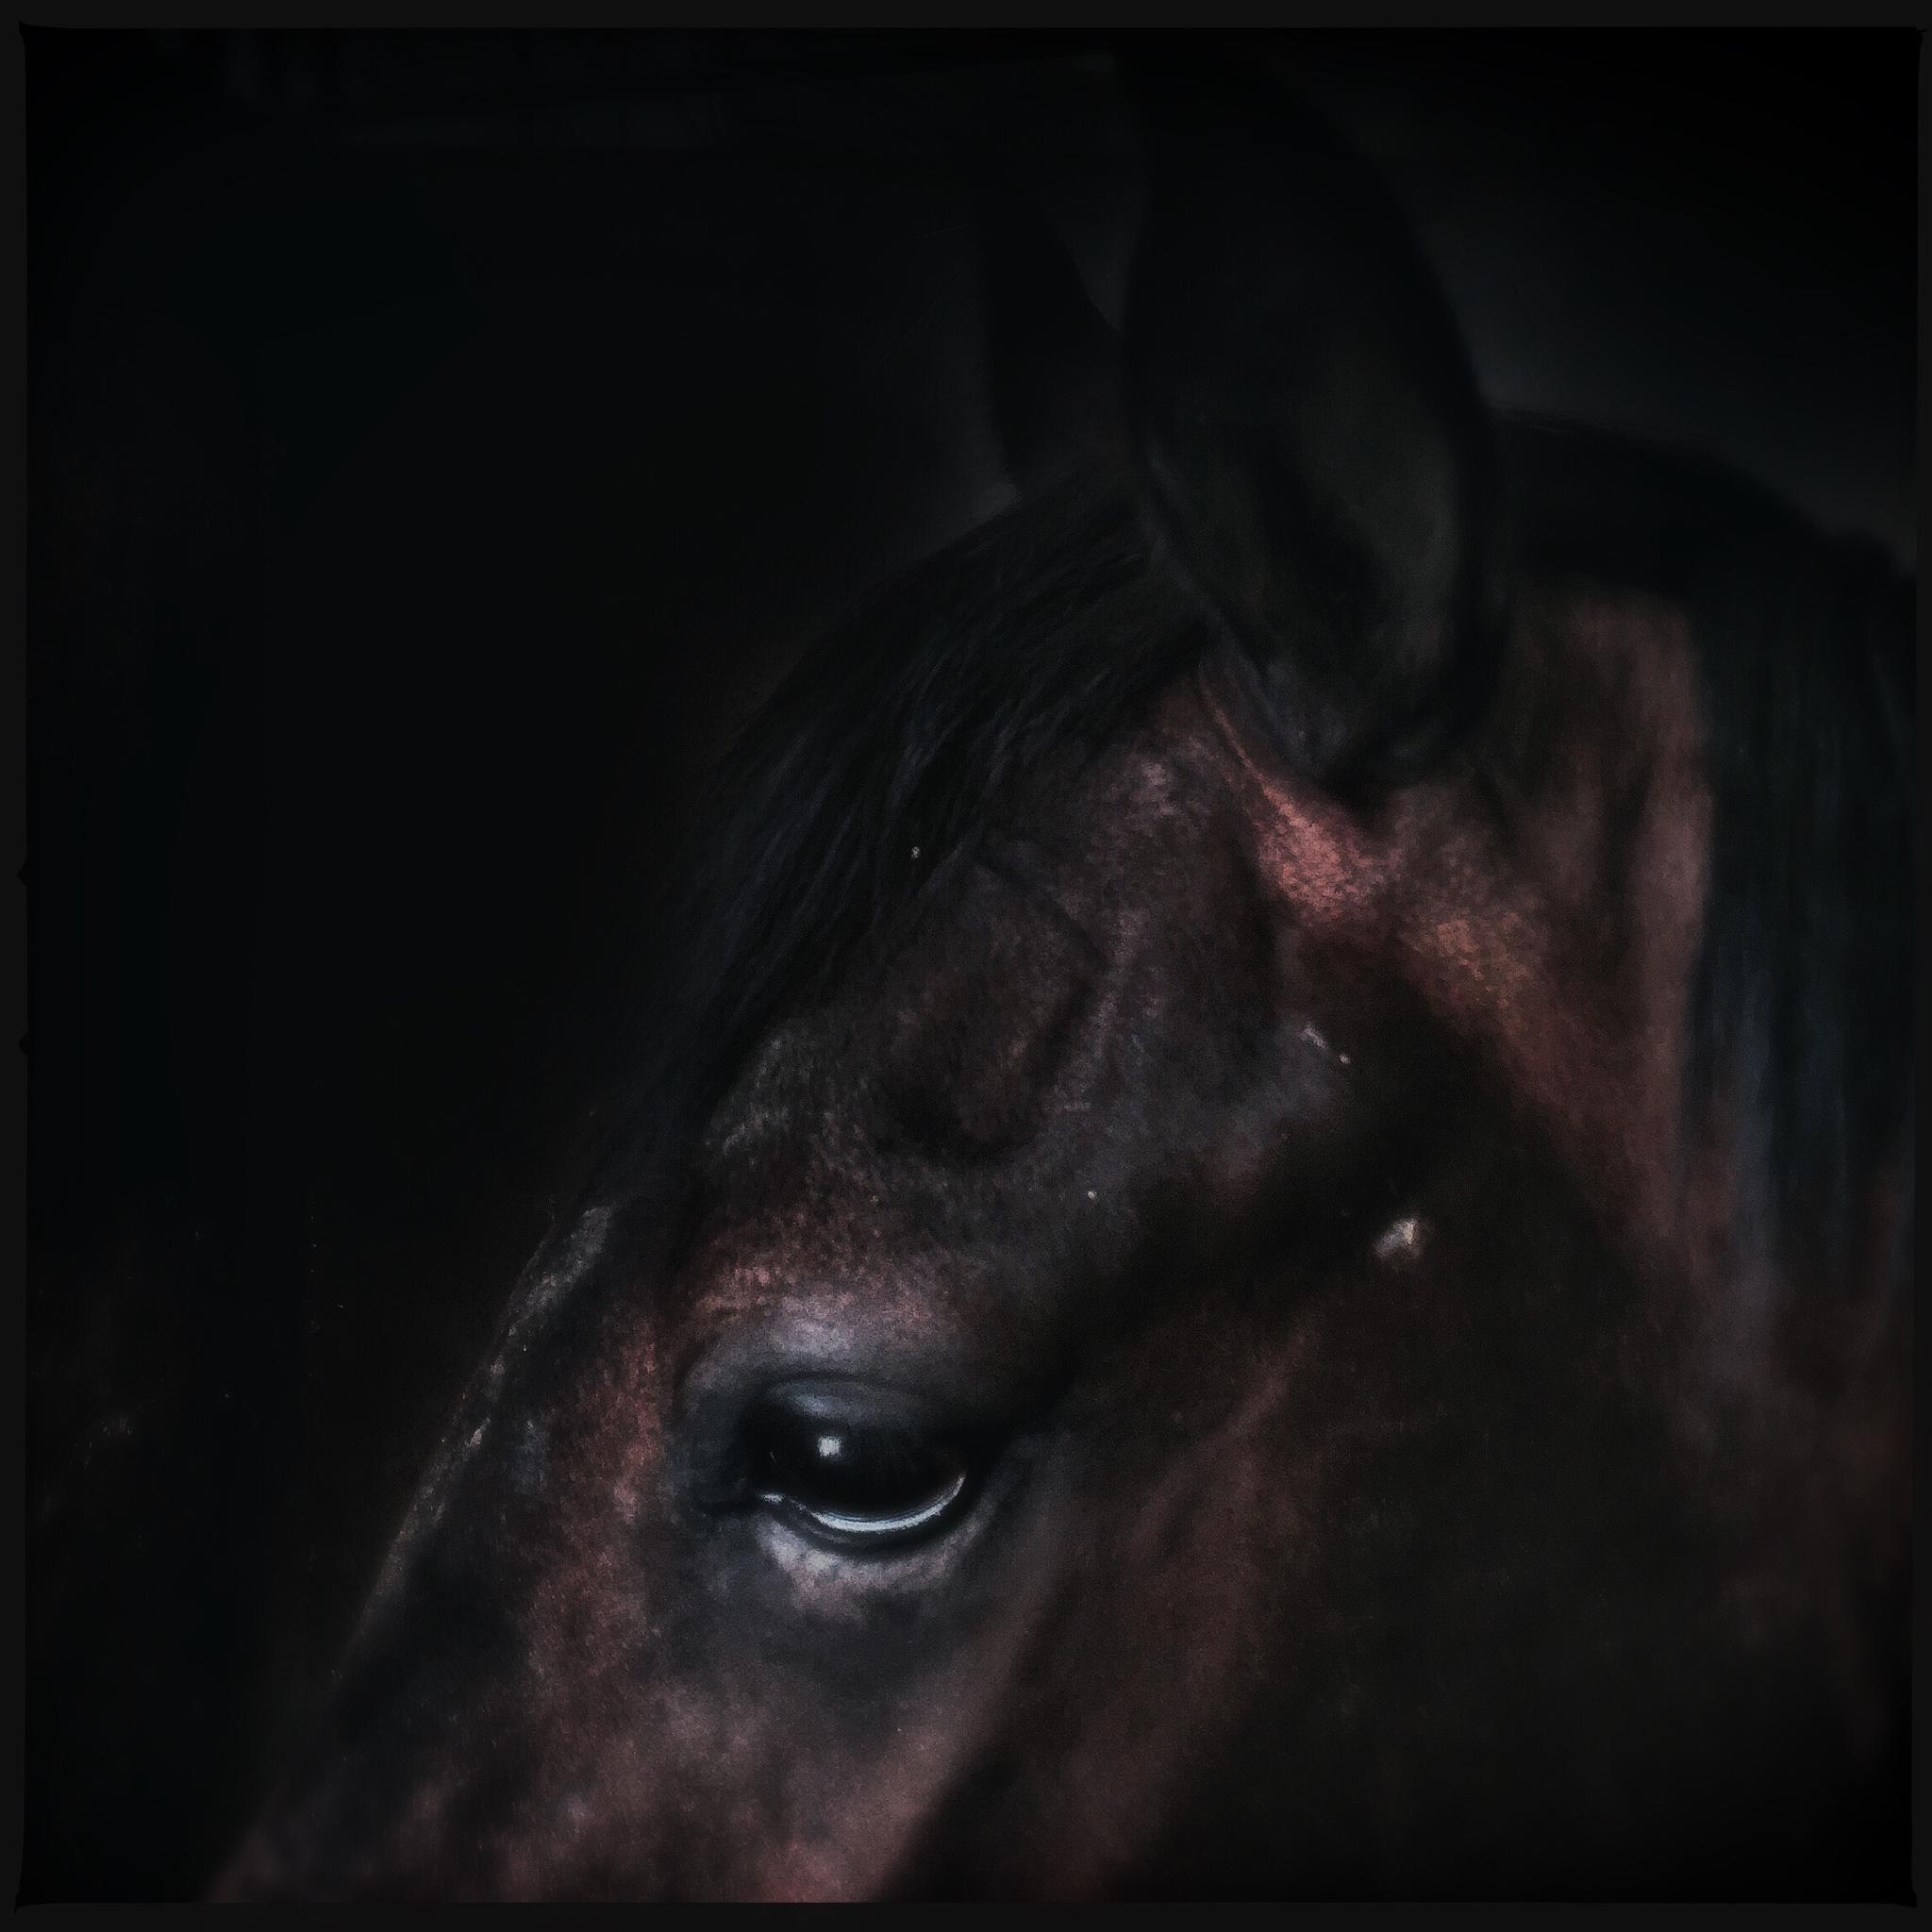 Horse by Silvano Pupella